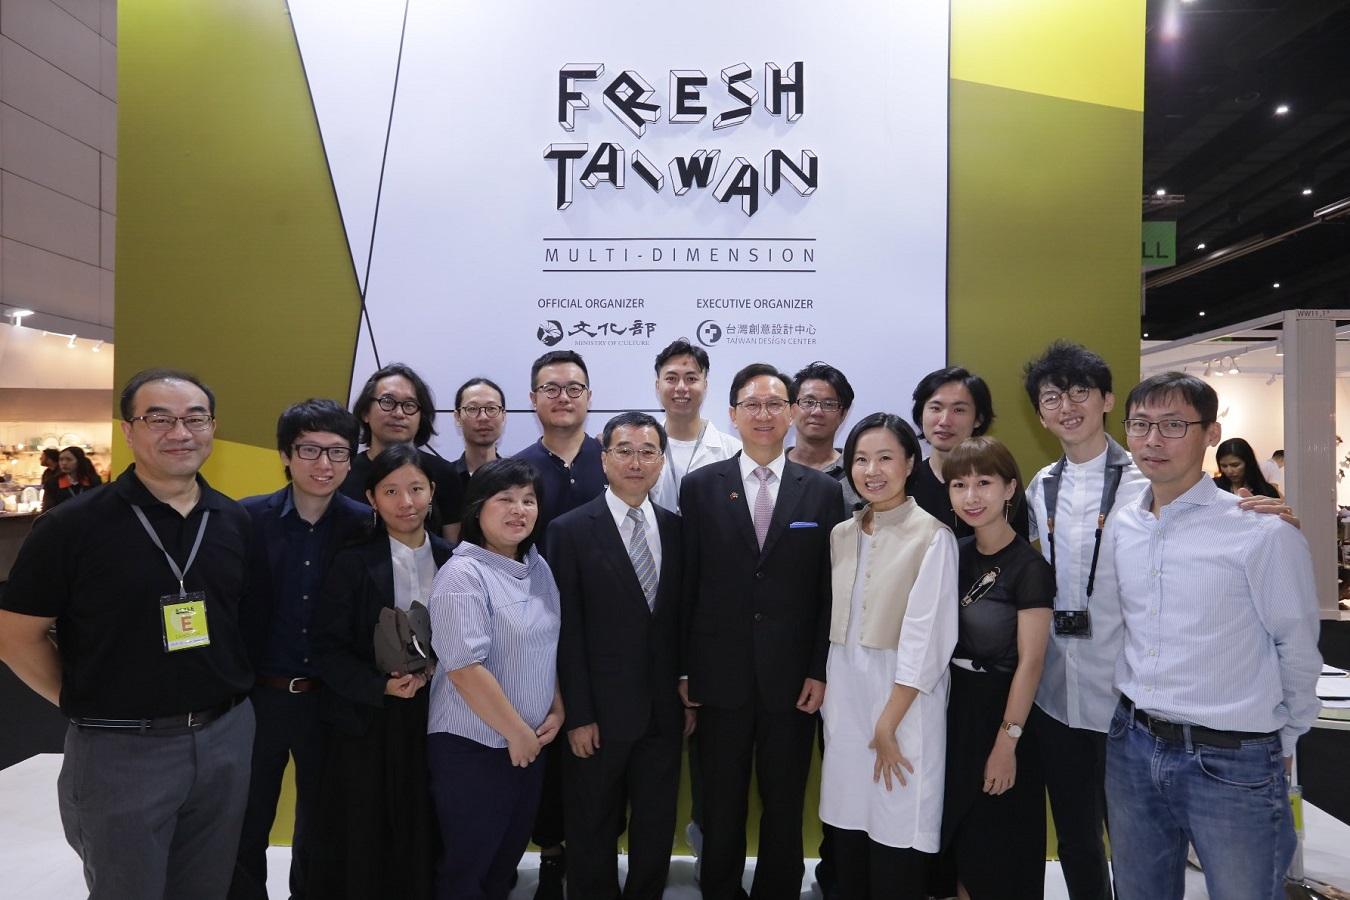 Fresh Taiwan臺灣設計潮流 驚豔曼谷百貨